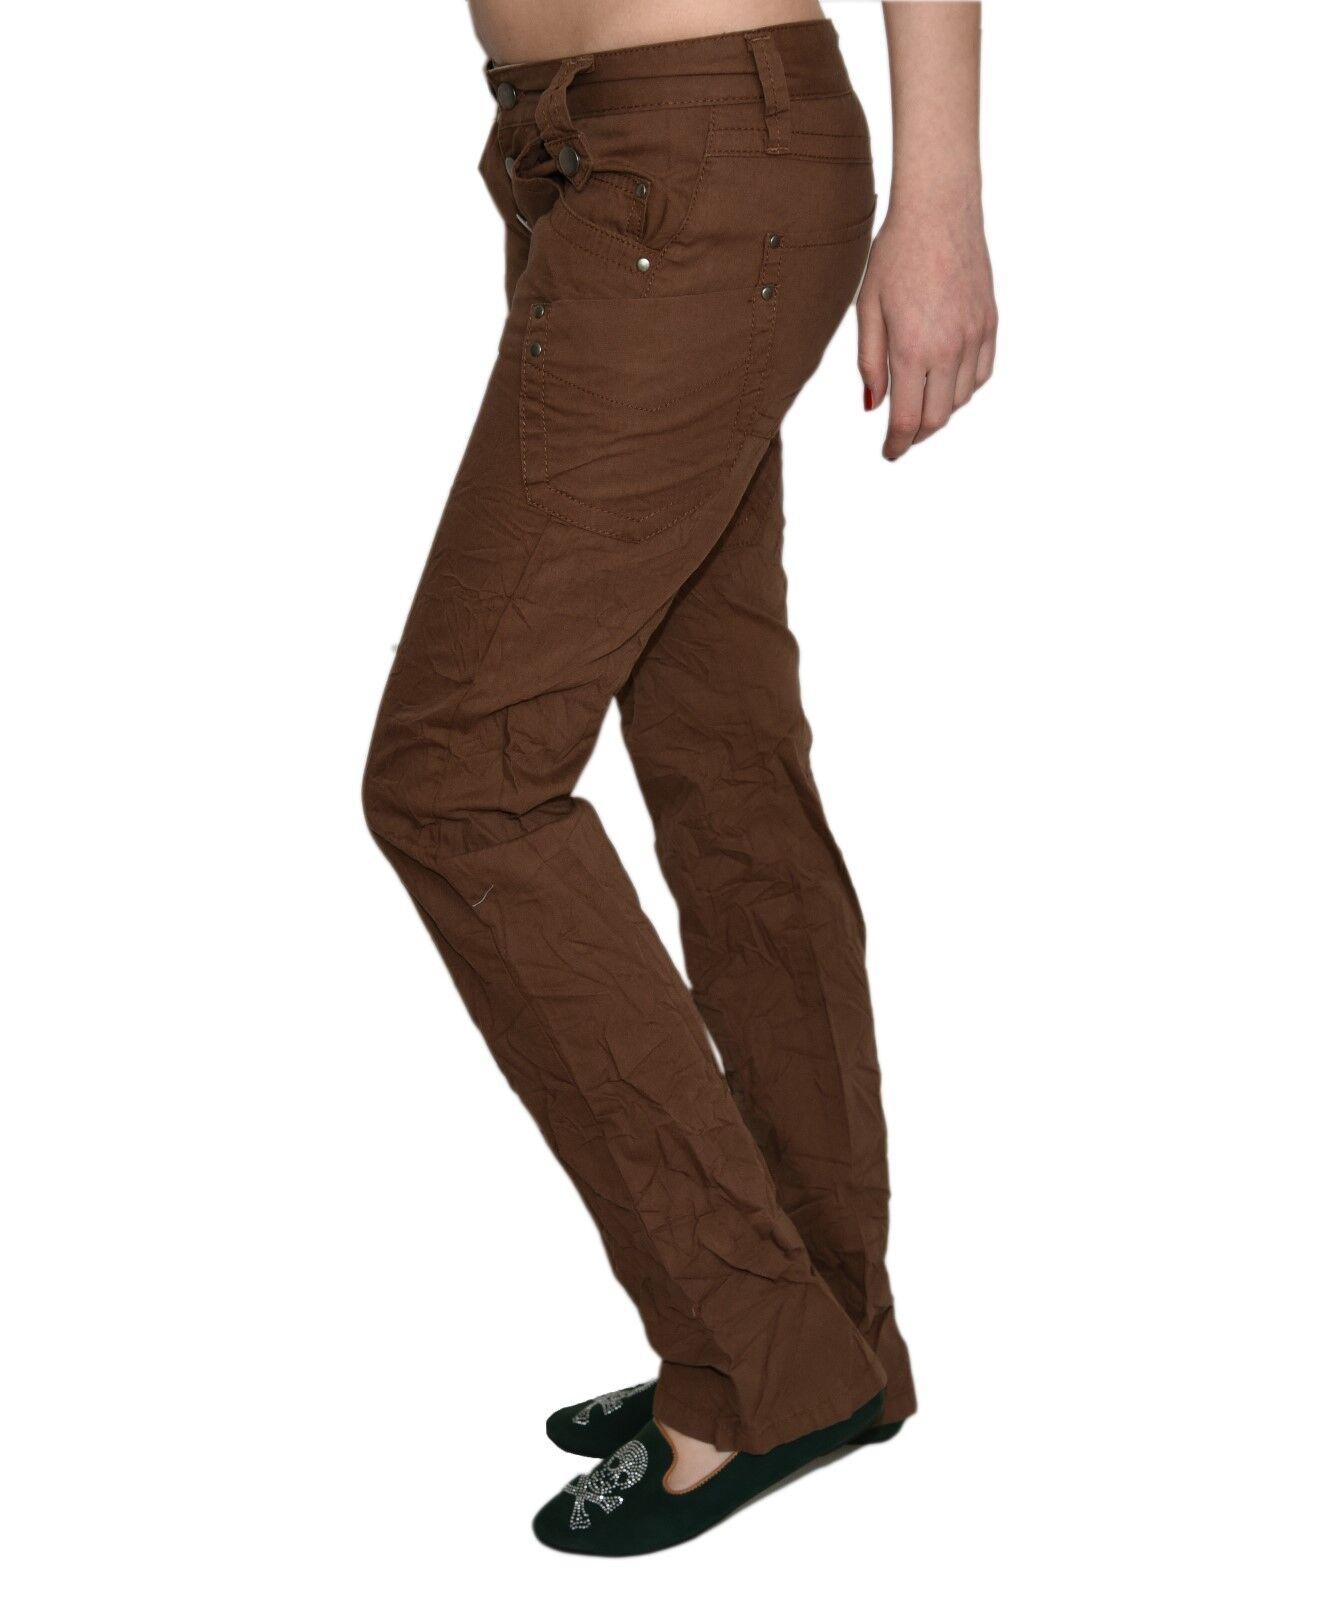 Damen Jeans Hüfthose Hose Denim Stoff Braun Bootcut Decon-Yvonne-